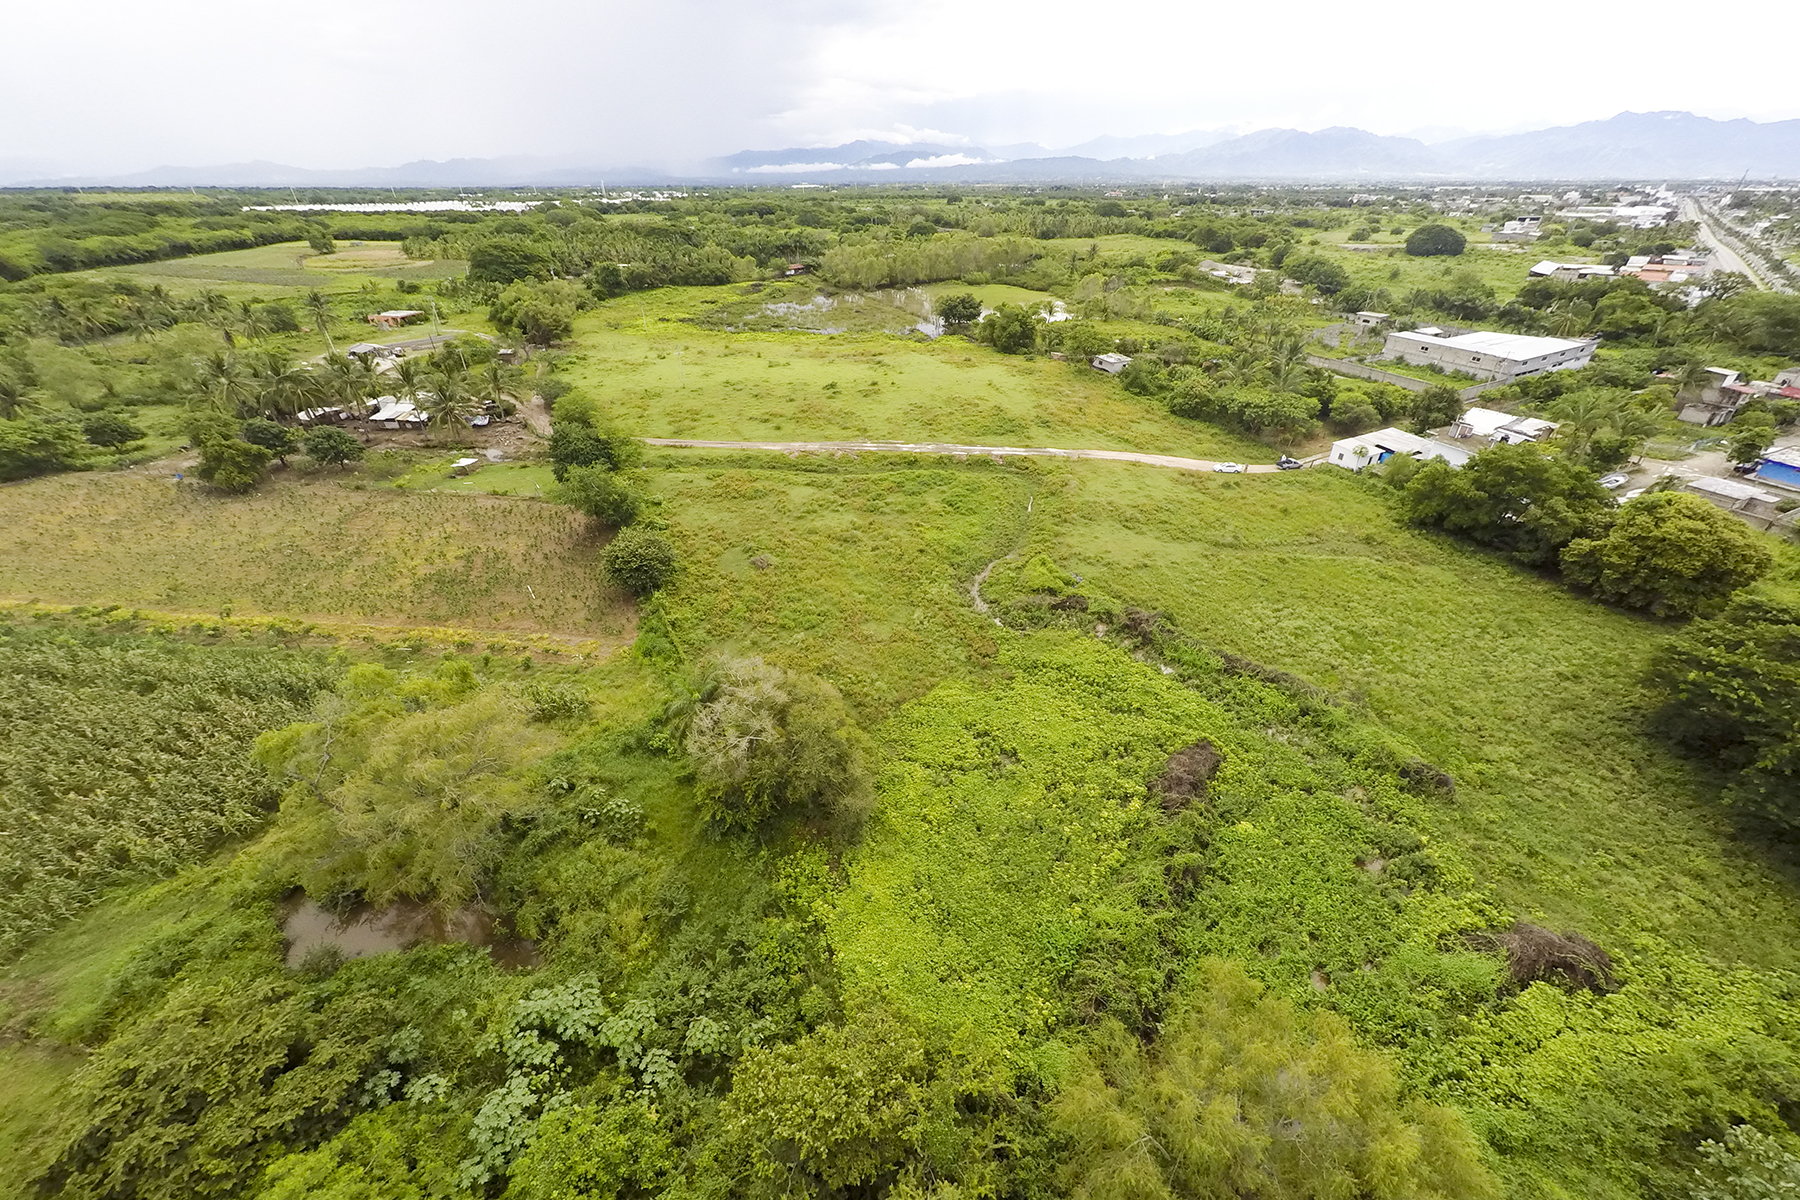 Additional photo for property listing at Tondoroque Lot Carretera Puerto Vallarta - Tepic Entre Tondoroque y Mezcales Nuevo Vallarta, Nayarit 63737 Mexico